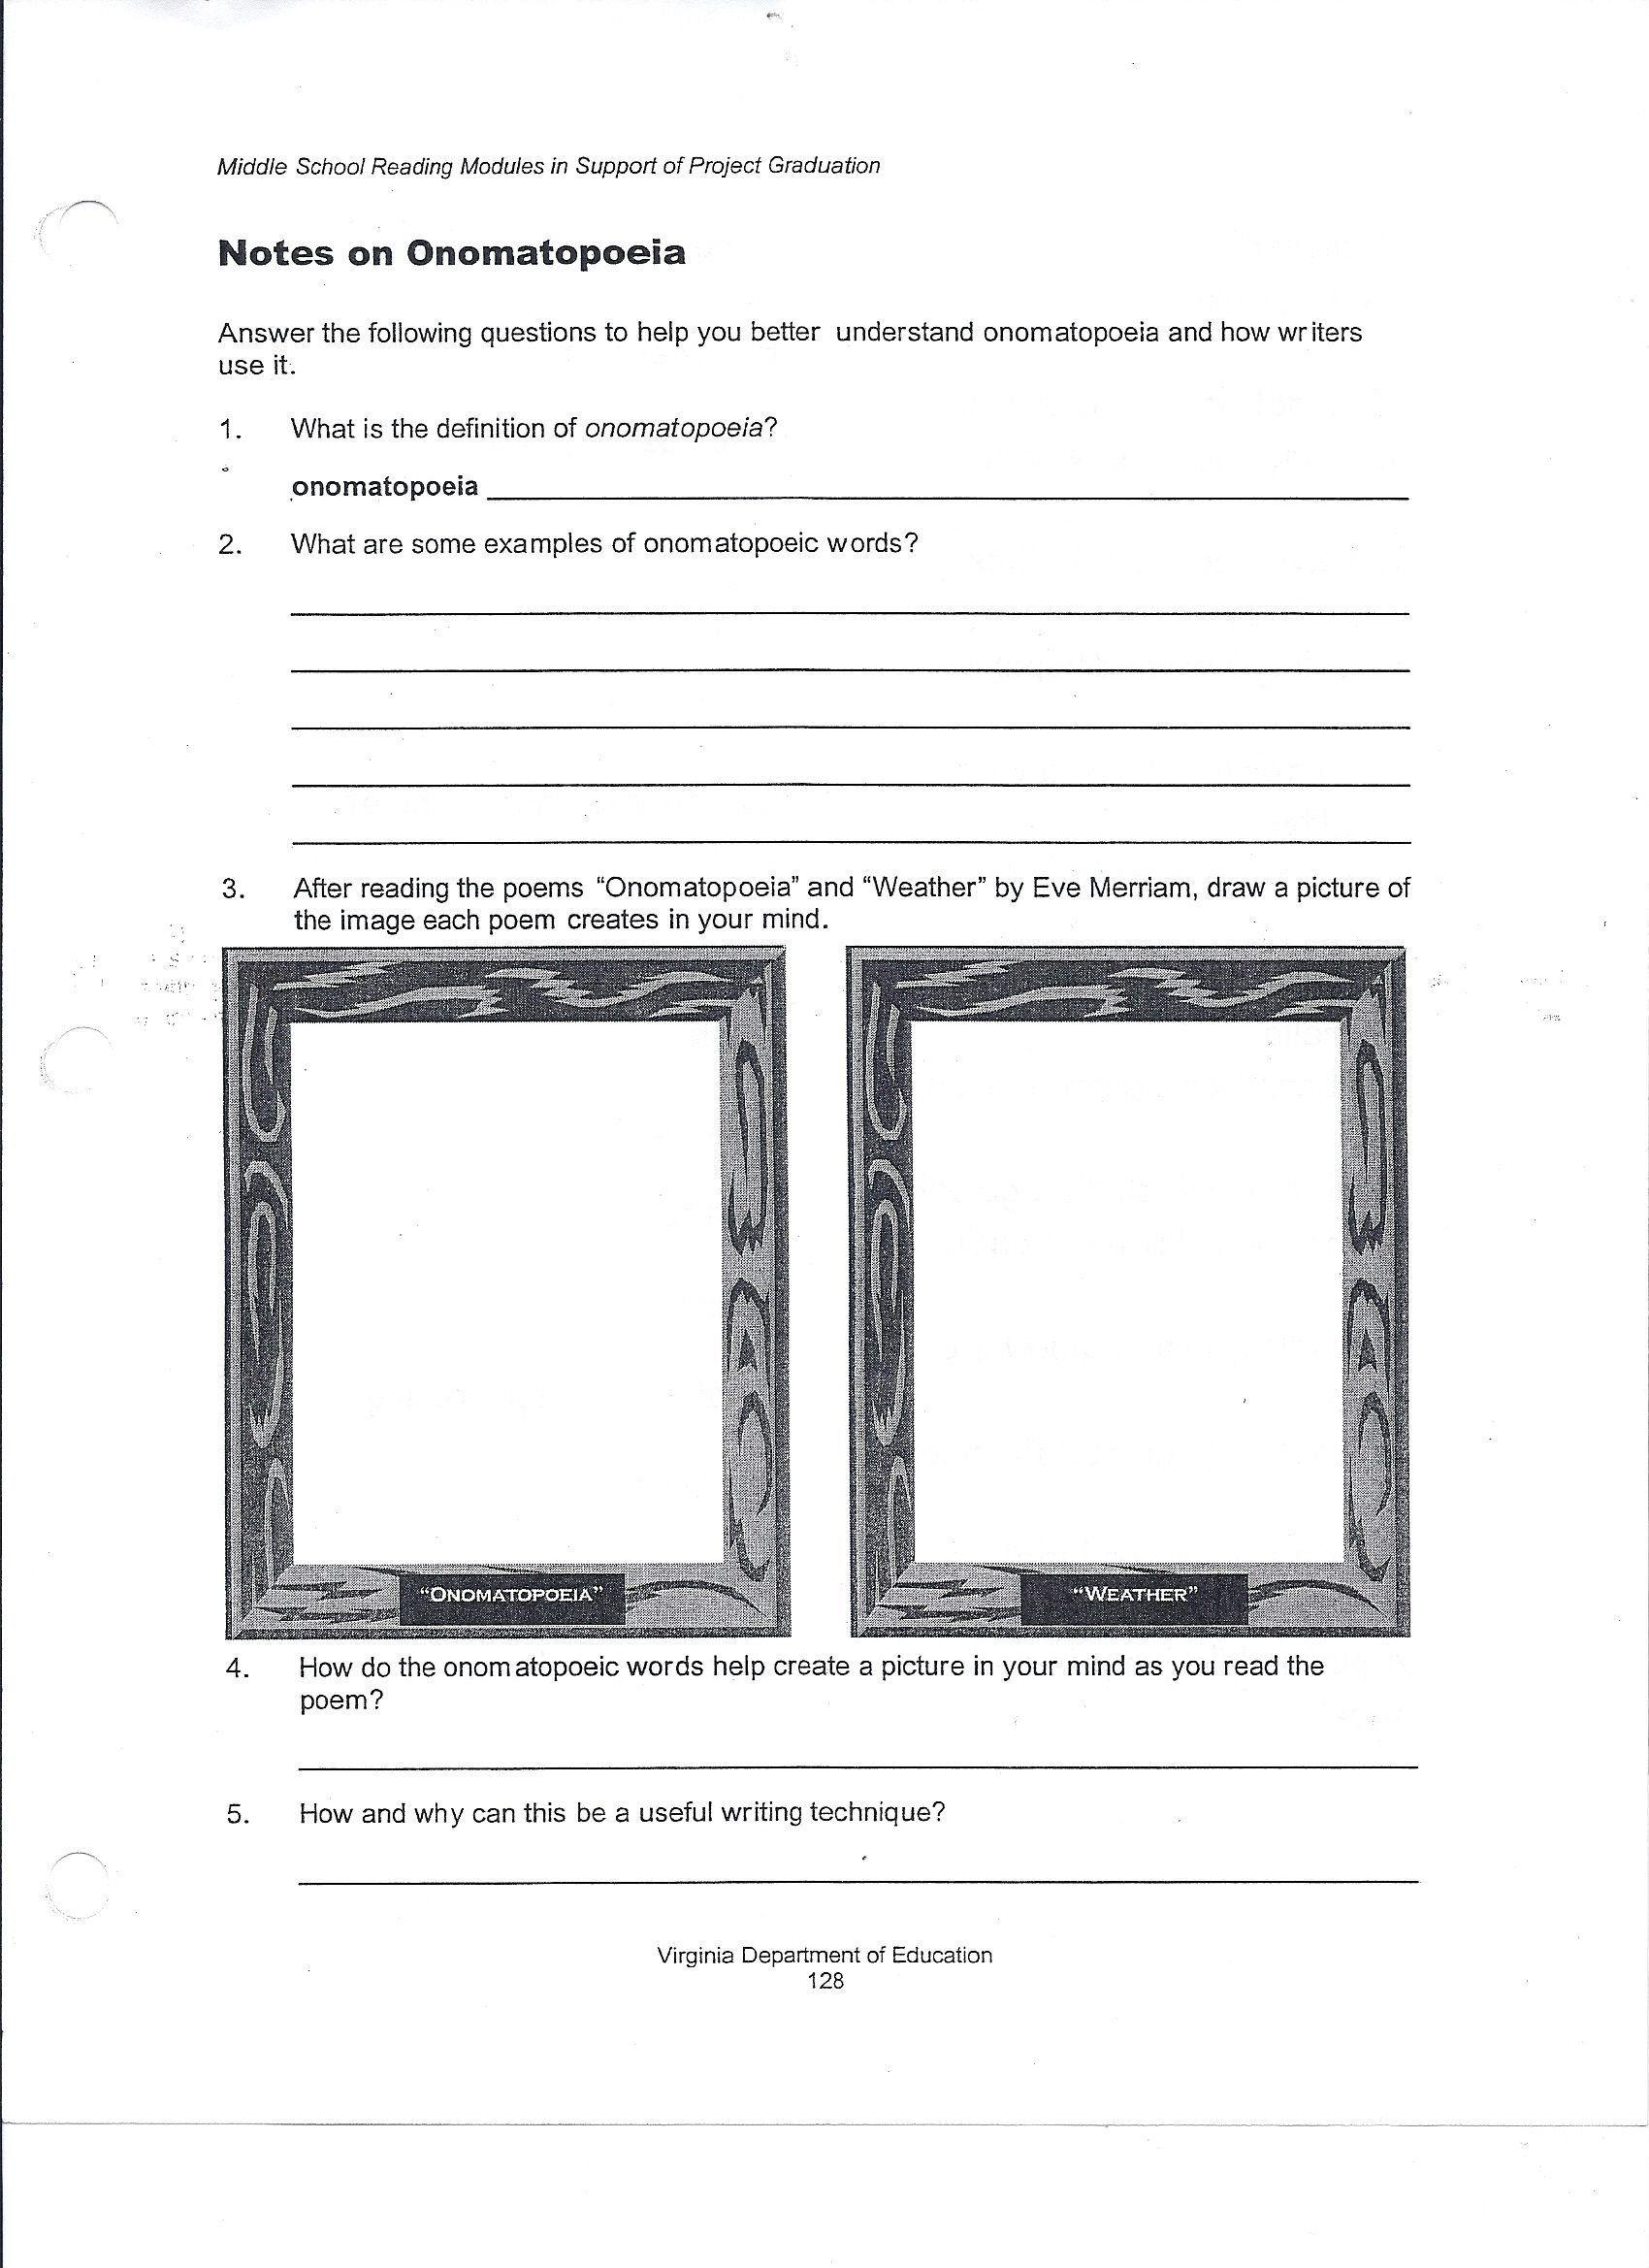 6th Grade Poetry Worksheet Elements Art Worksheets Art Worksheets Middle School Art Worksheets Language Arts Worksheets